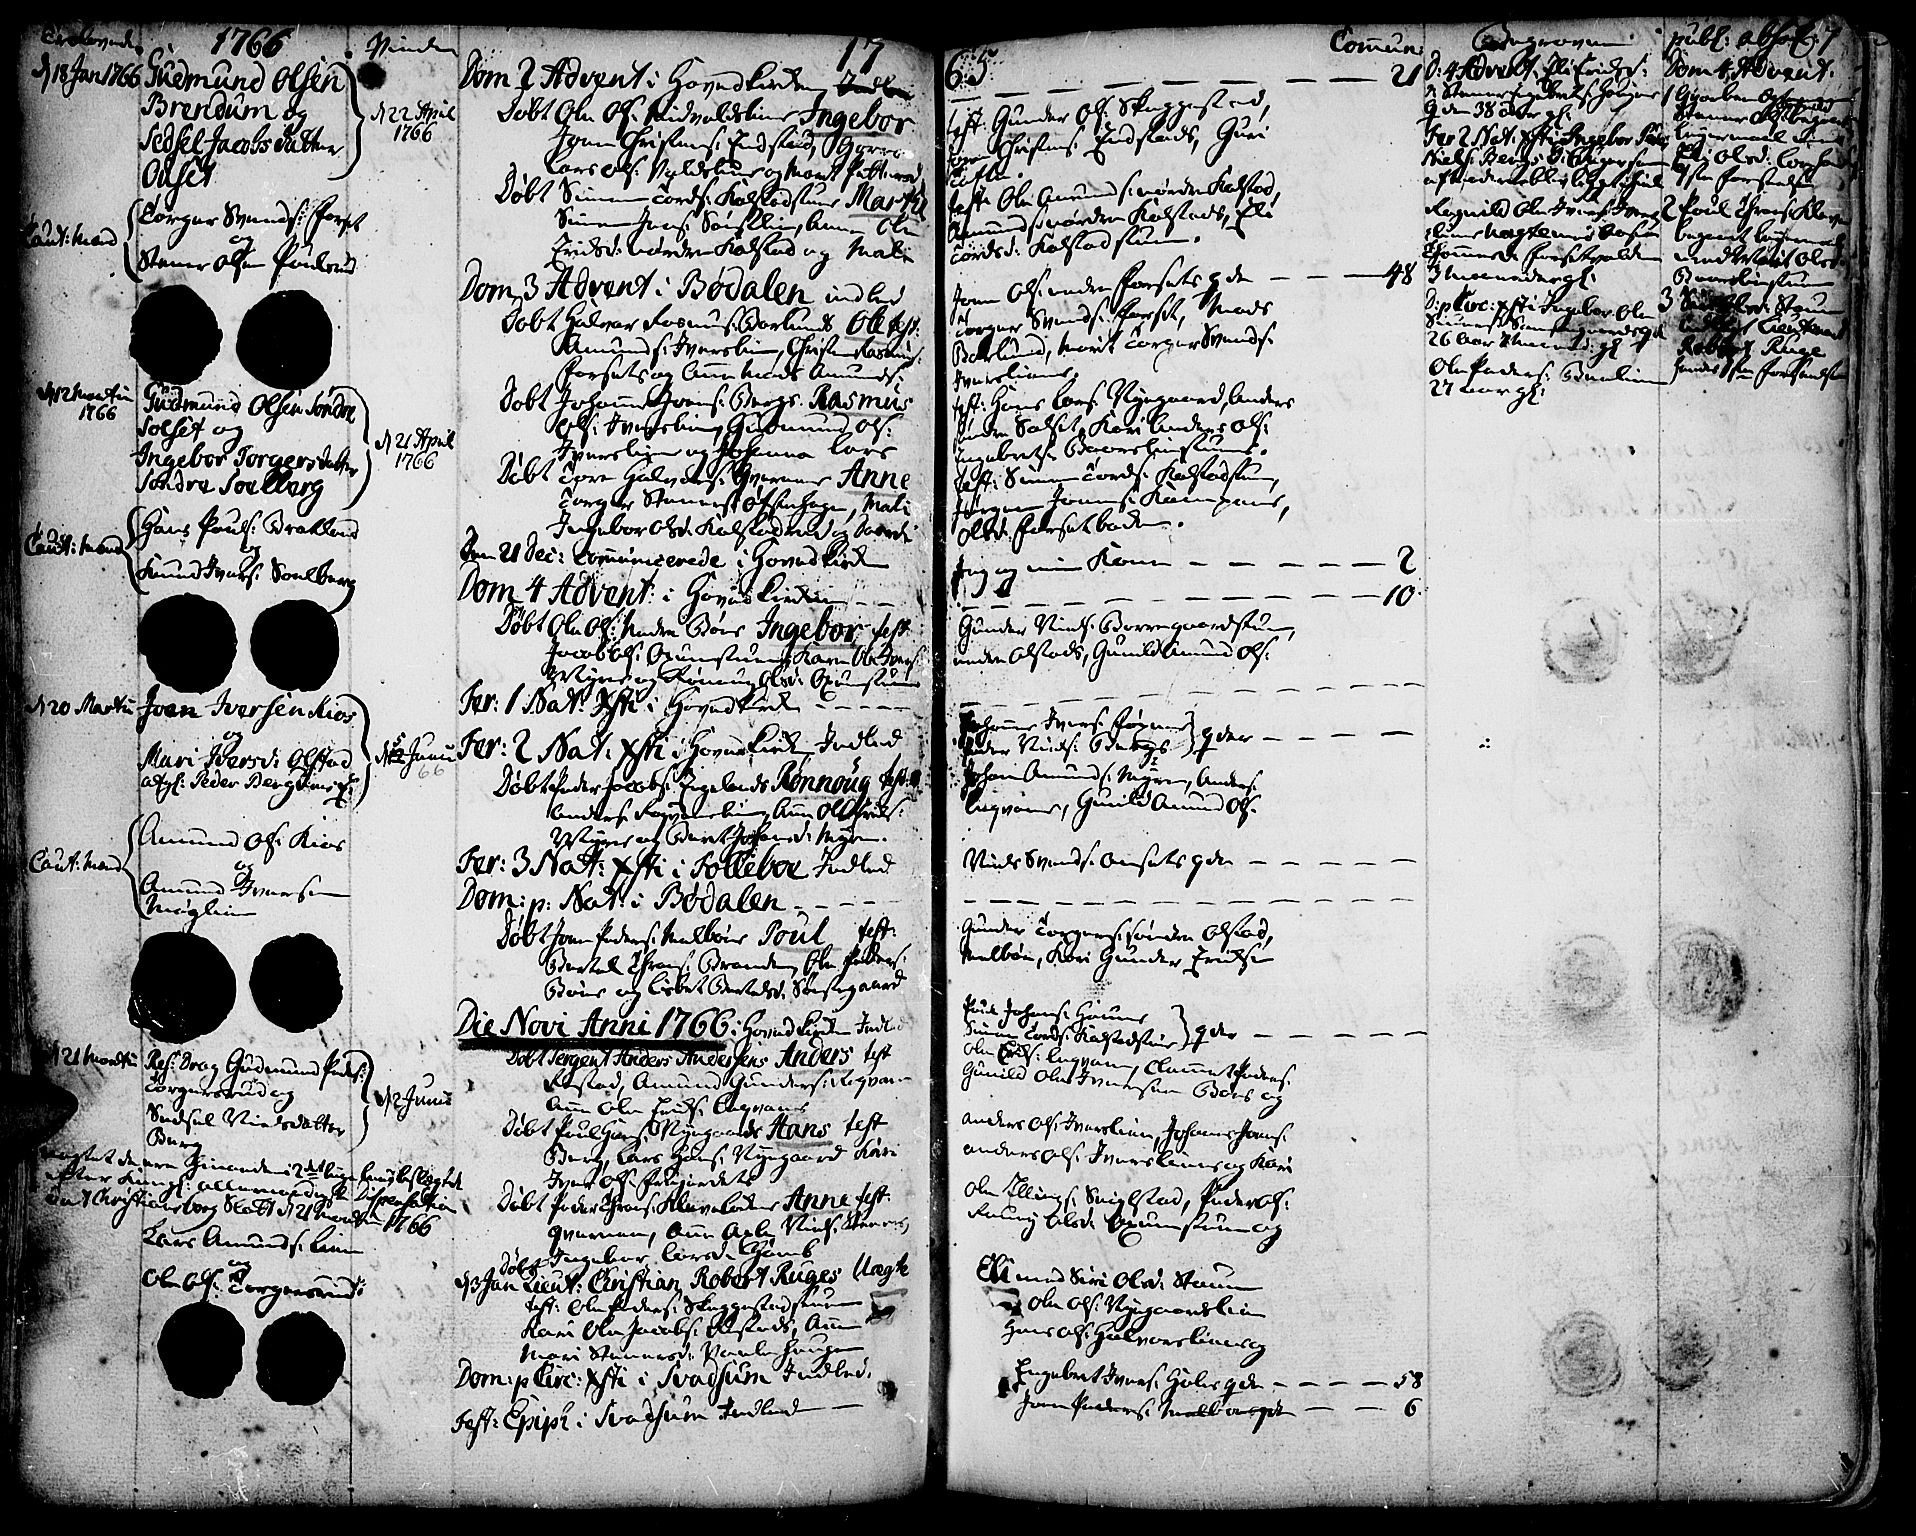 SAH, Gausdal prestekontor, Ministerialbok nr. 3, 1758-1809, s. 67